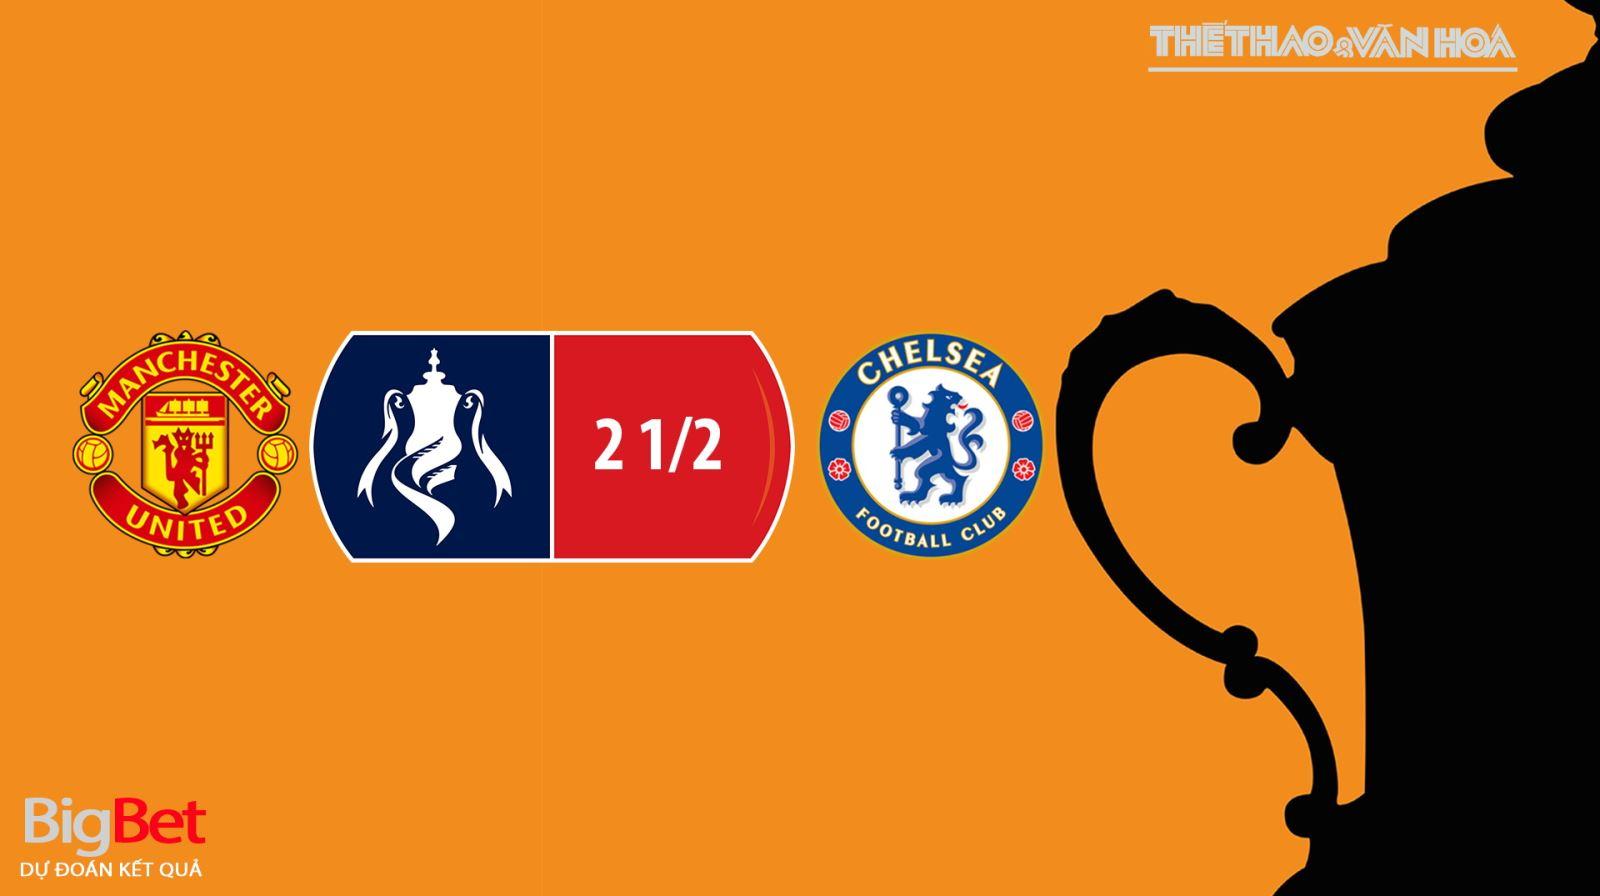 MUvs Chelsea, Chelsea, MU, soi kèo MUvs Chelsea, trực tiếp MUvs Chelsea, bóng đá, soi kèo bóng đá, soi kèo, kèo bóng đá